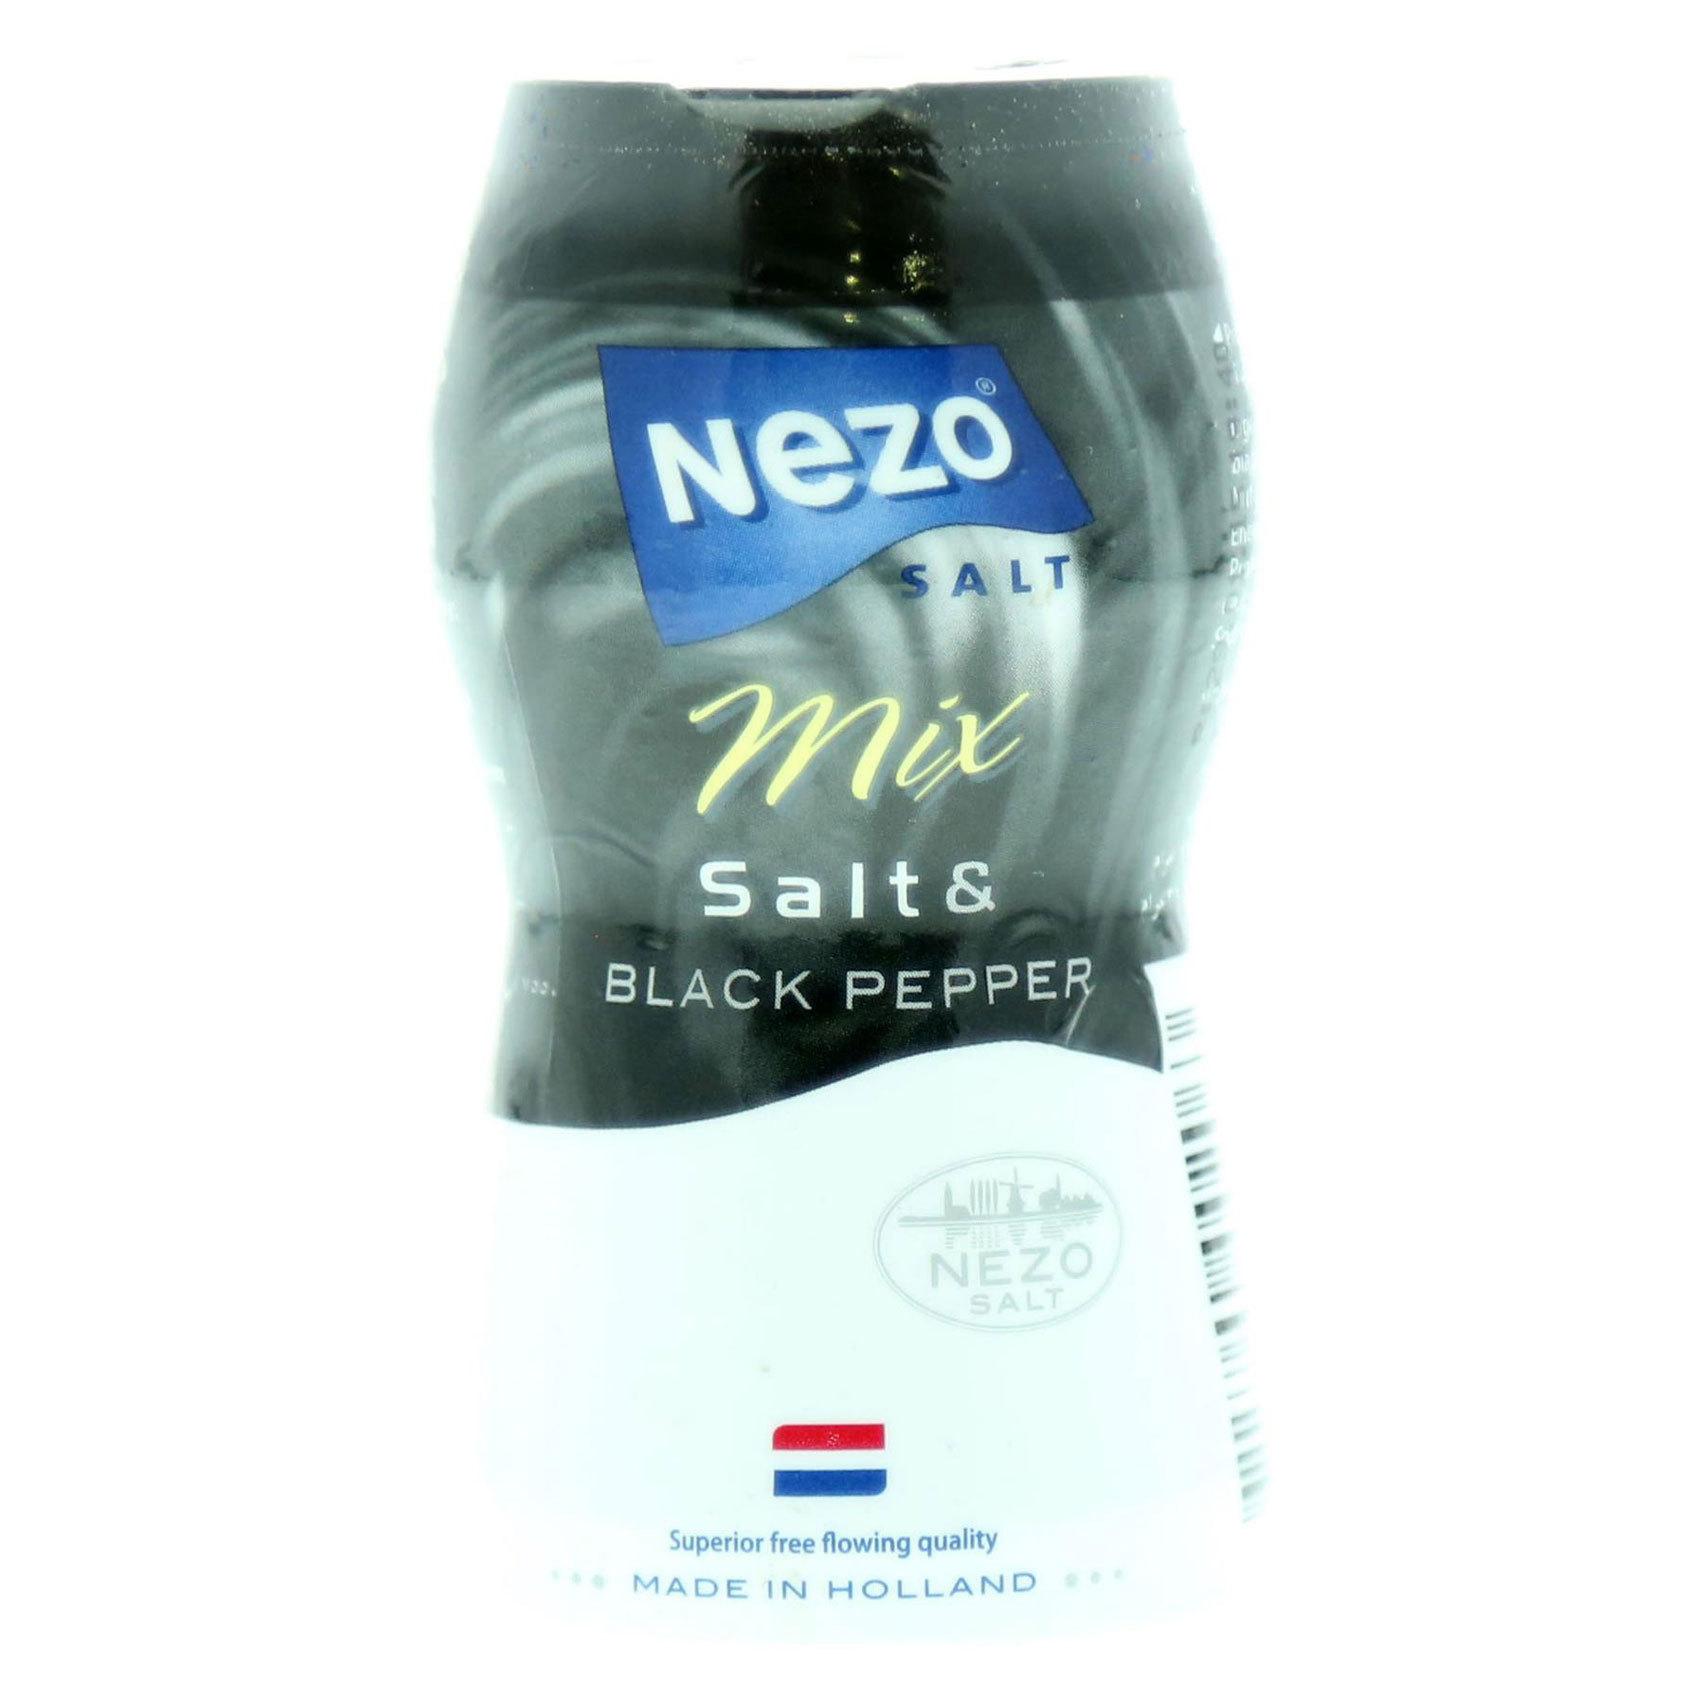 NEZO SALT MIX SALT&BLACKPEPPER 100G